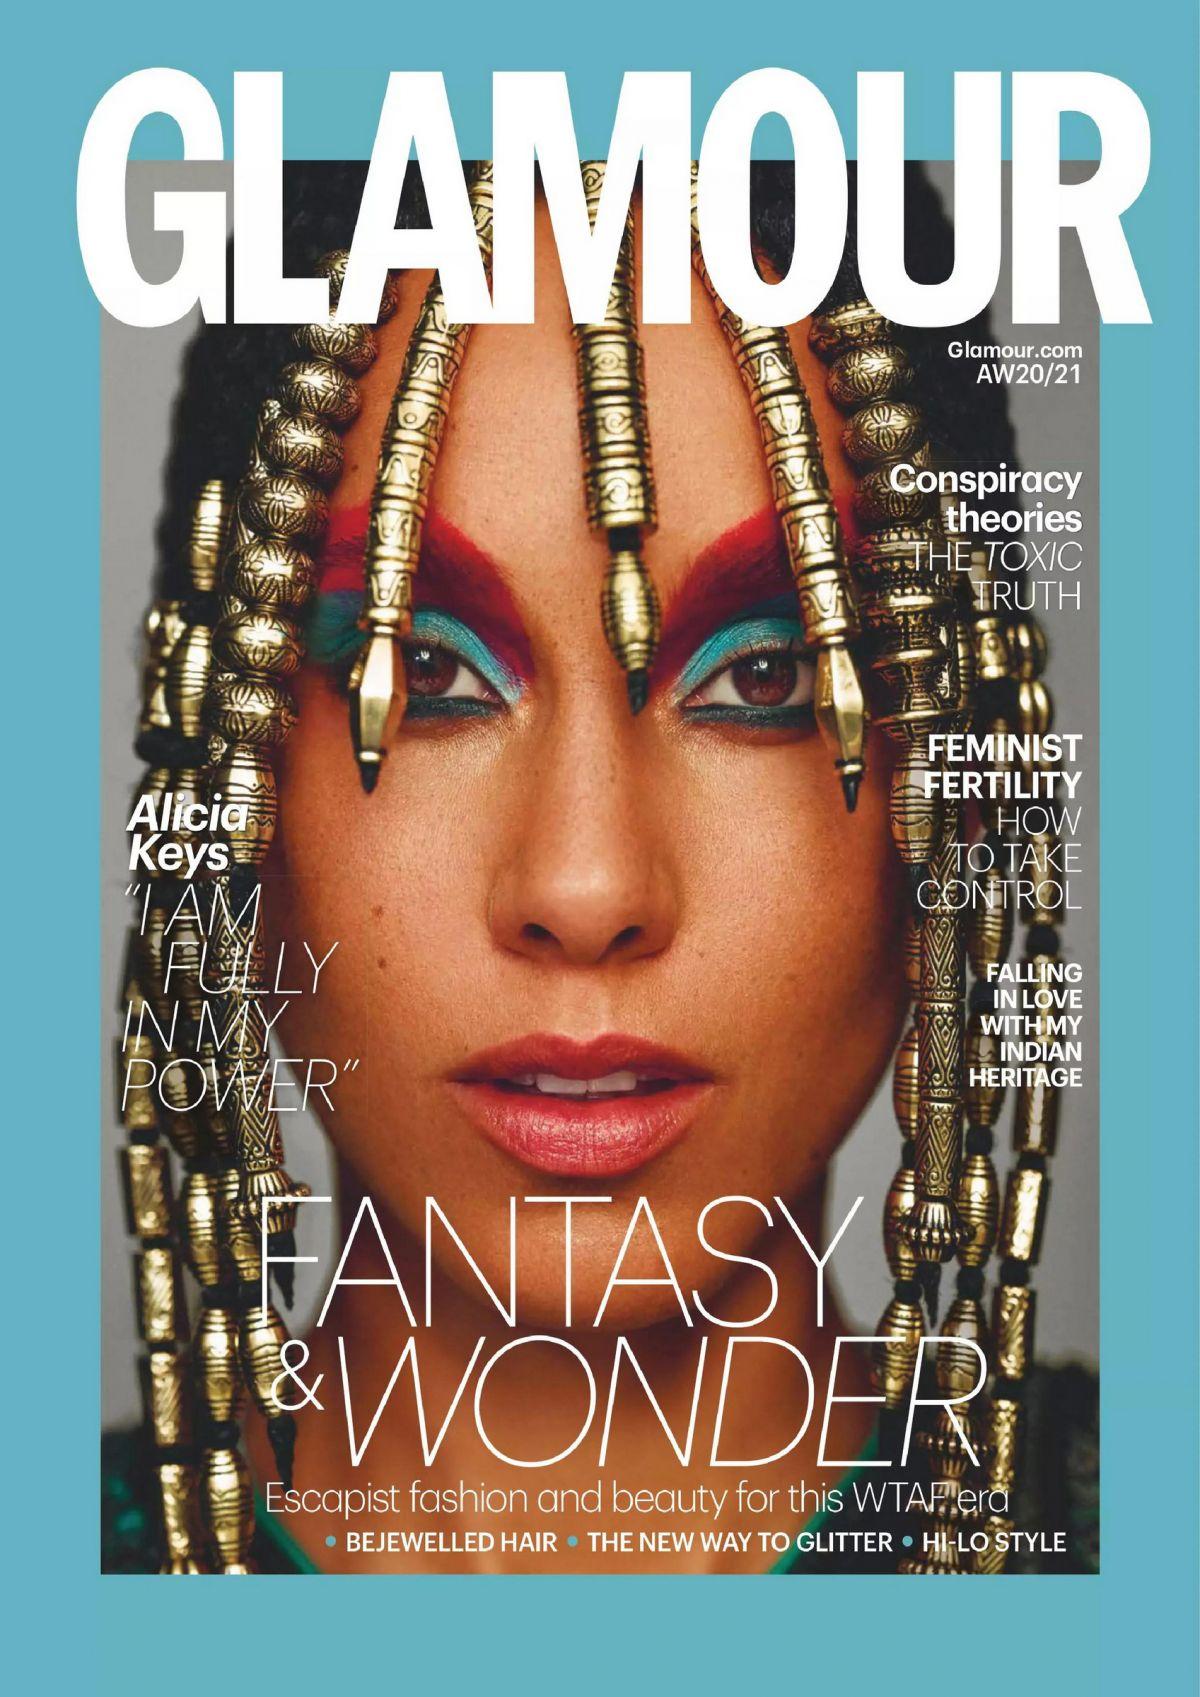 Kate Upton Stars in Glamour, Talks Having Body Confidence